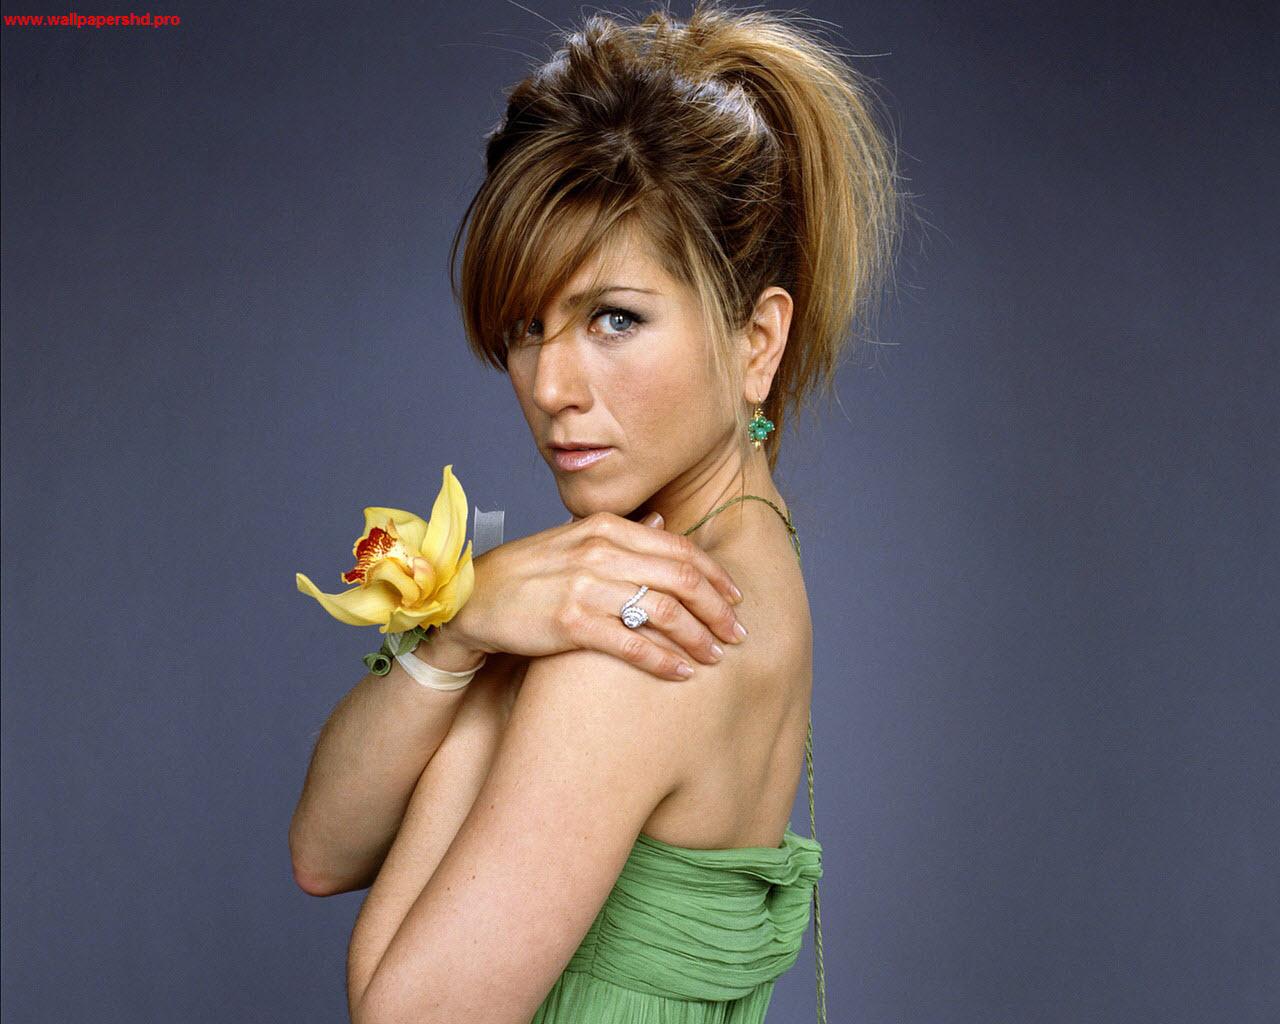 http://4.bp.blogspot.com/-cd0w5qWRYtQ/UKkgEBVA02I/AAAAAAAASco/yhESt1uzUss/s1600/Jennifer+Aniston+(1).jpg